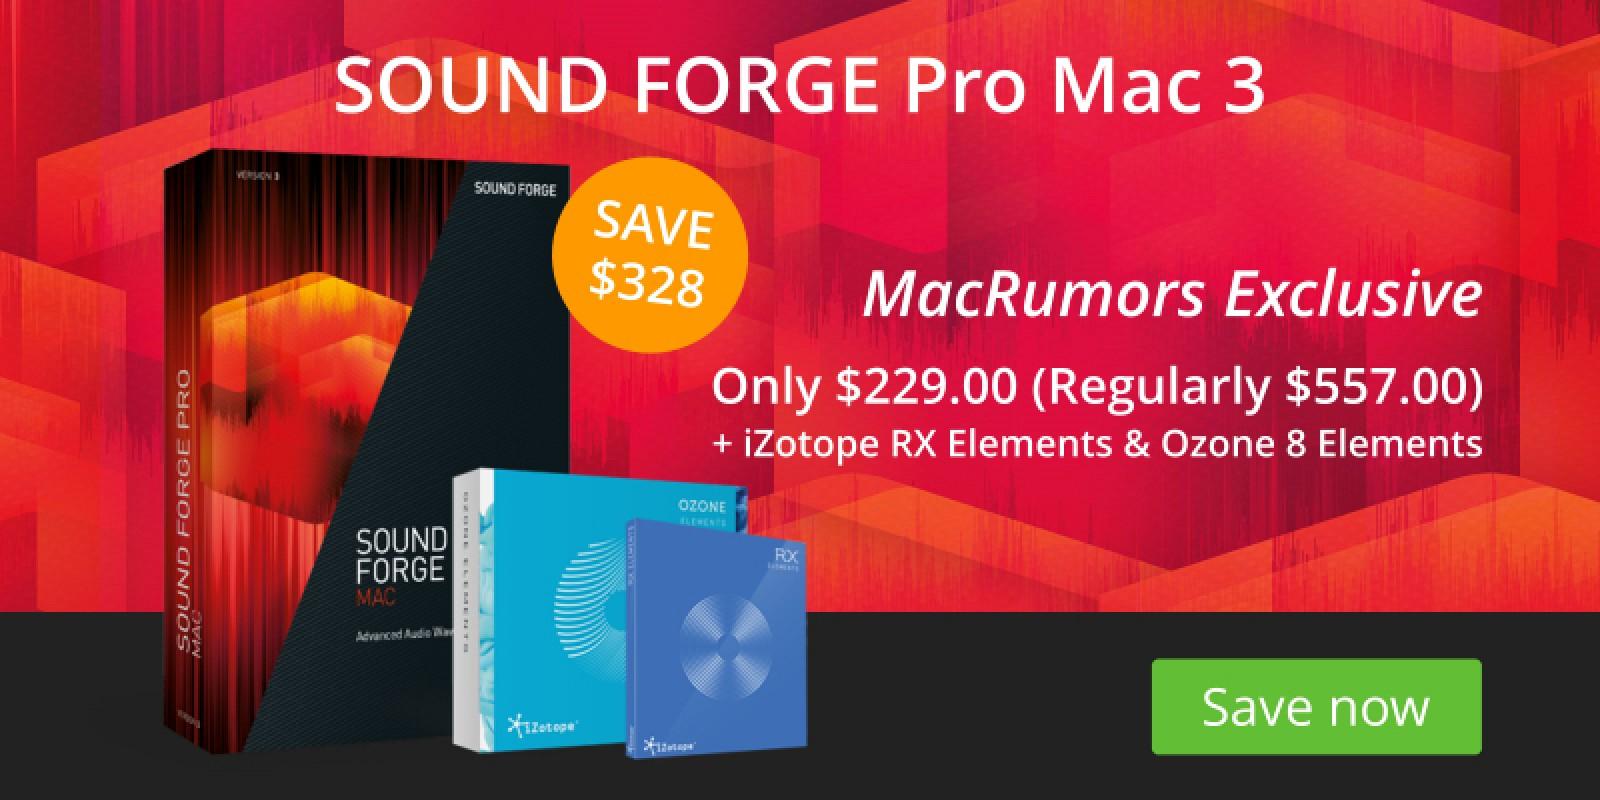 MacRumors - Apple Mac iPhone Rumors and News